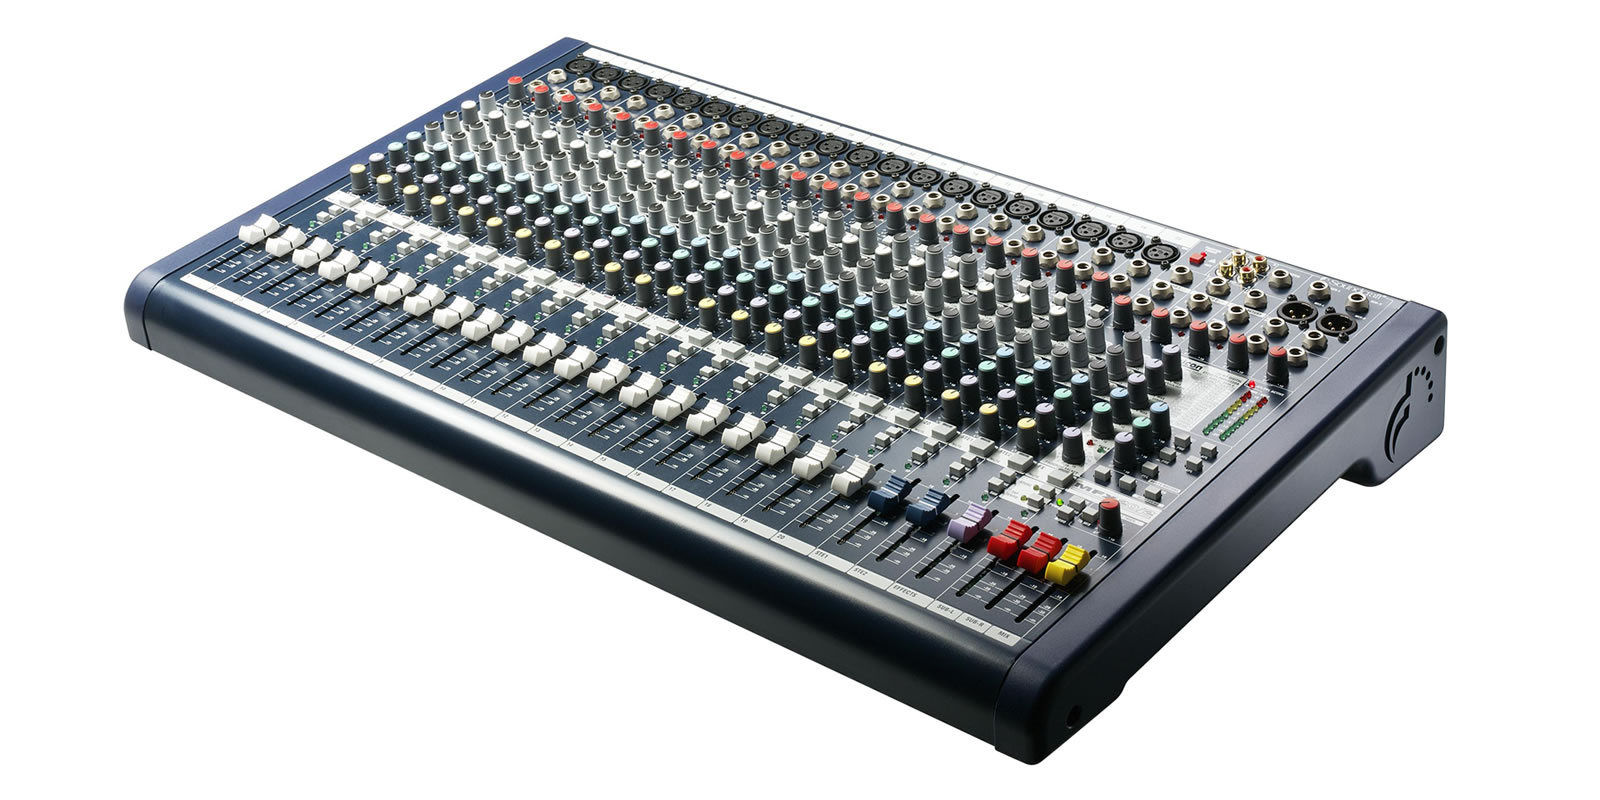 Yamaha Empowered Mixer